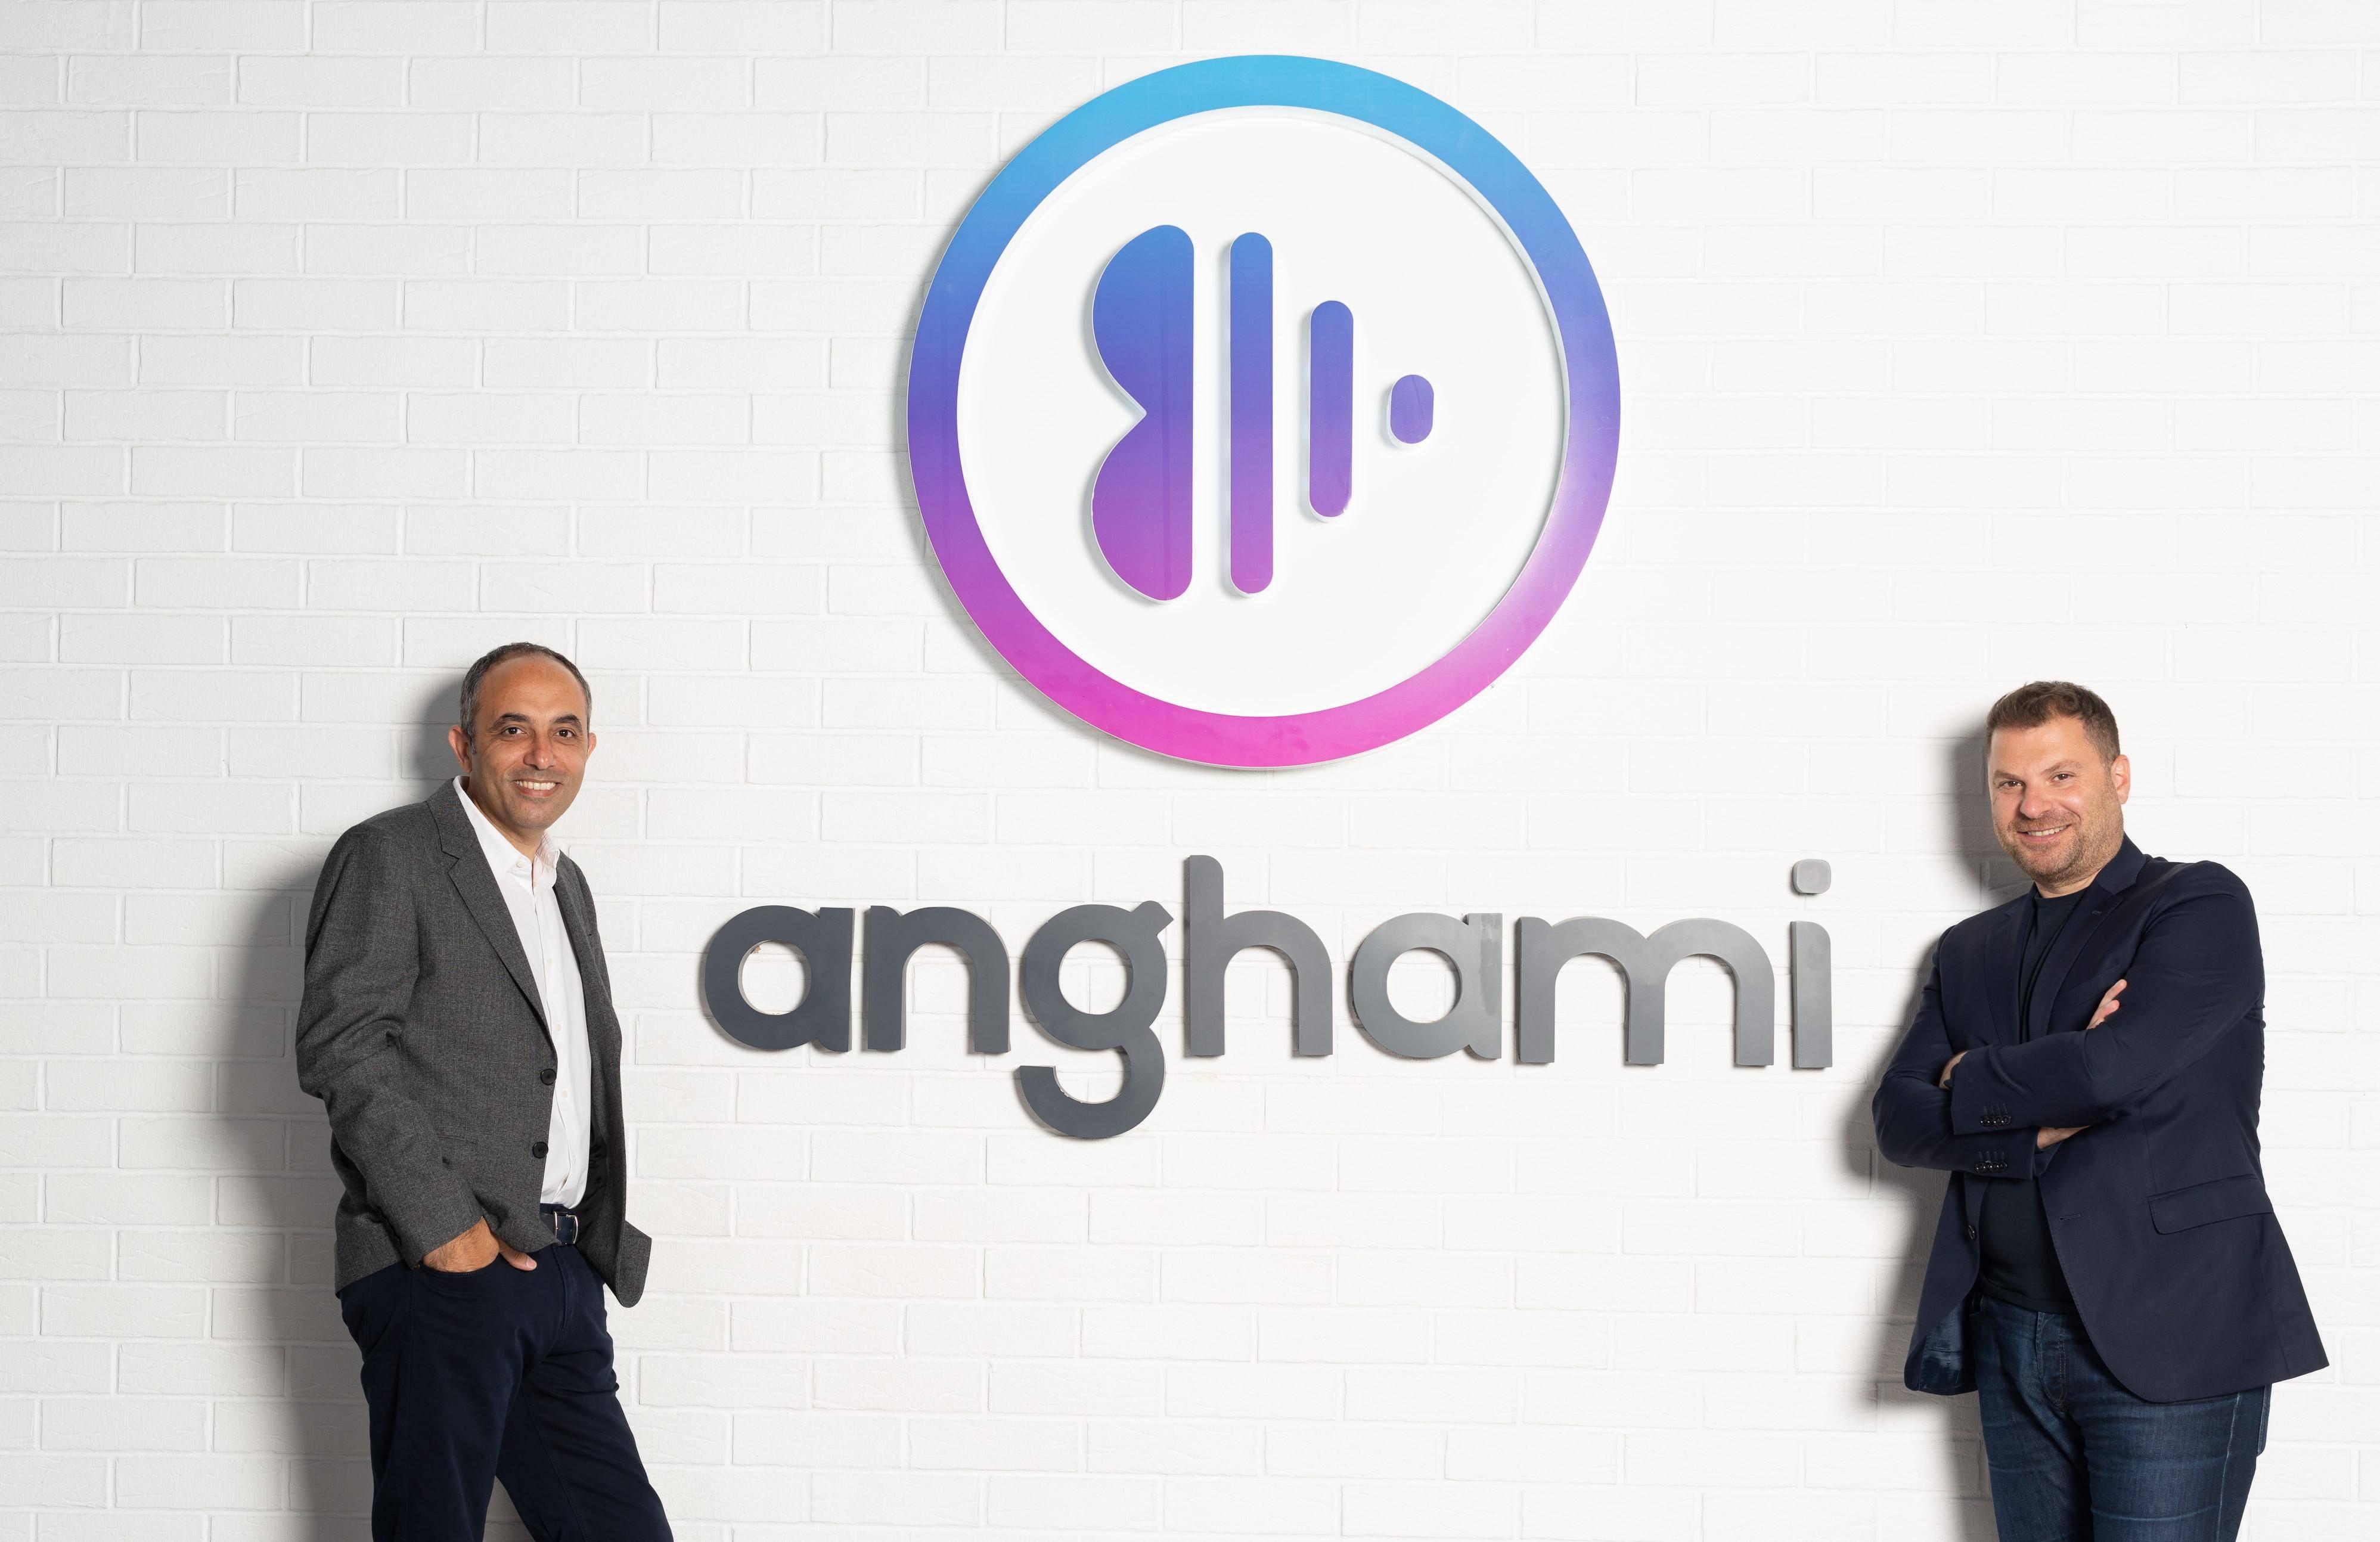 Anghami to list on Nasdaq New York, merges with Vistas Media Acquisition Company Inc